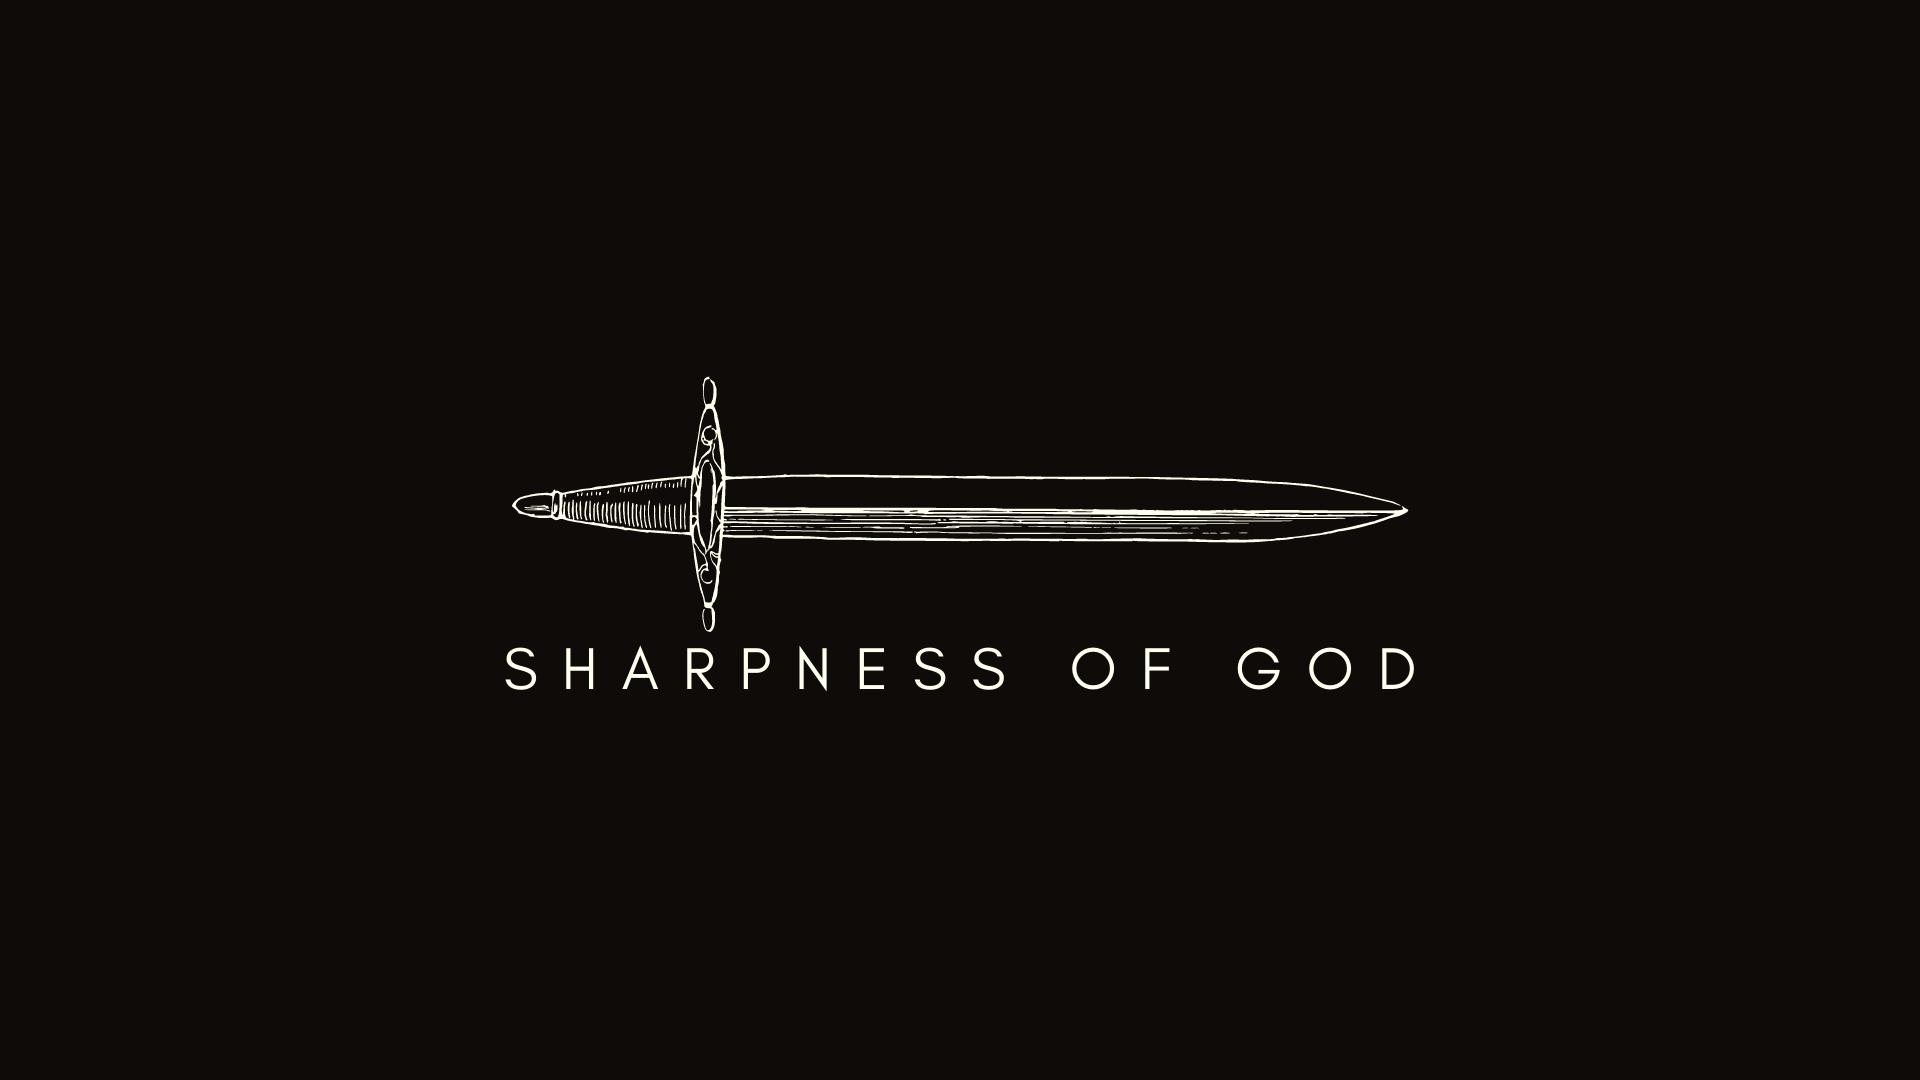 Sharpness of God